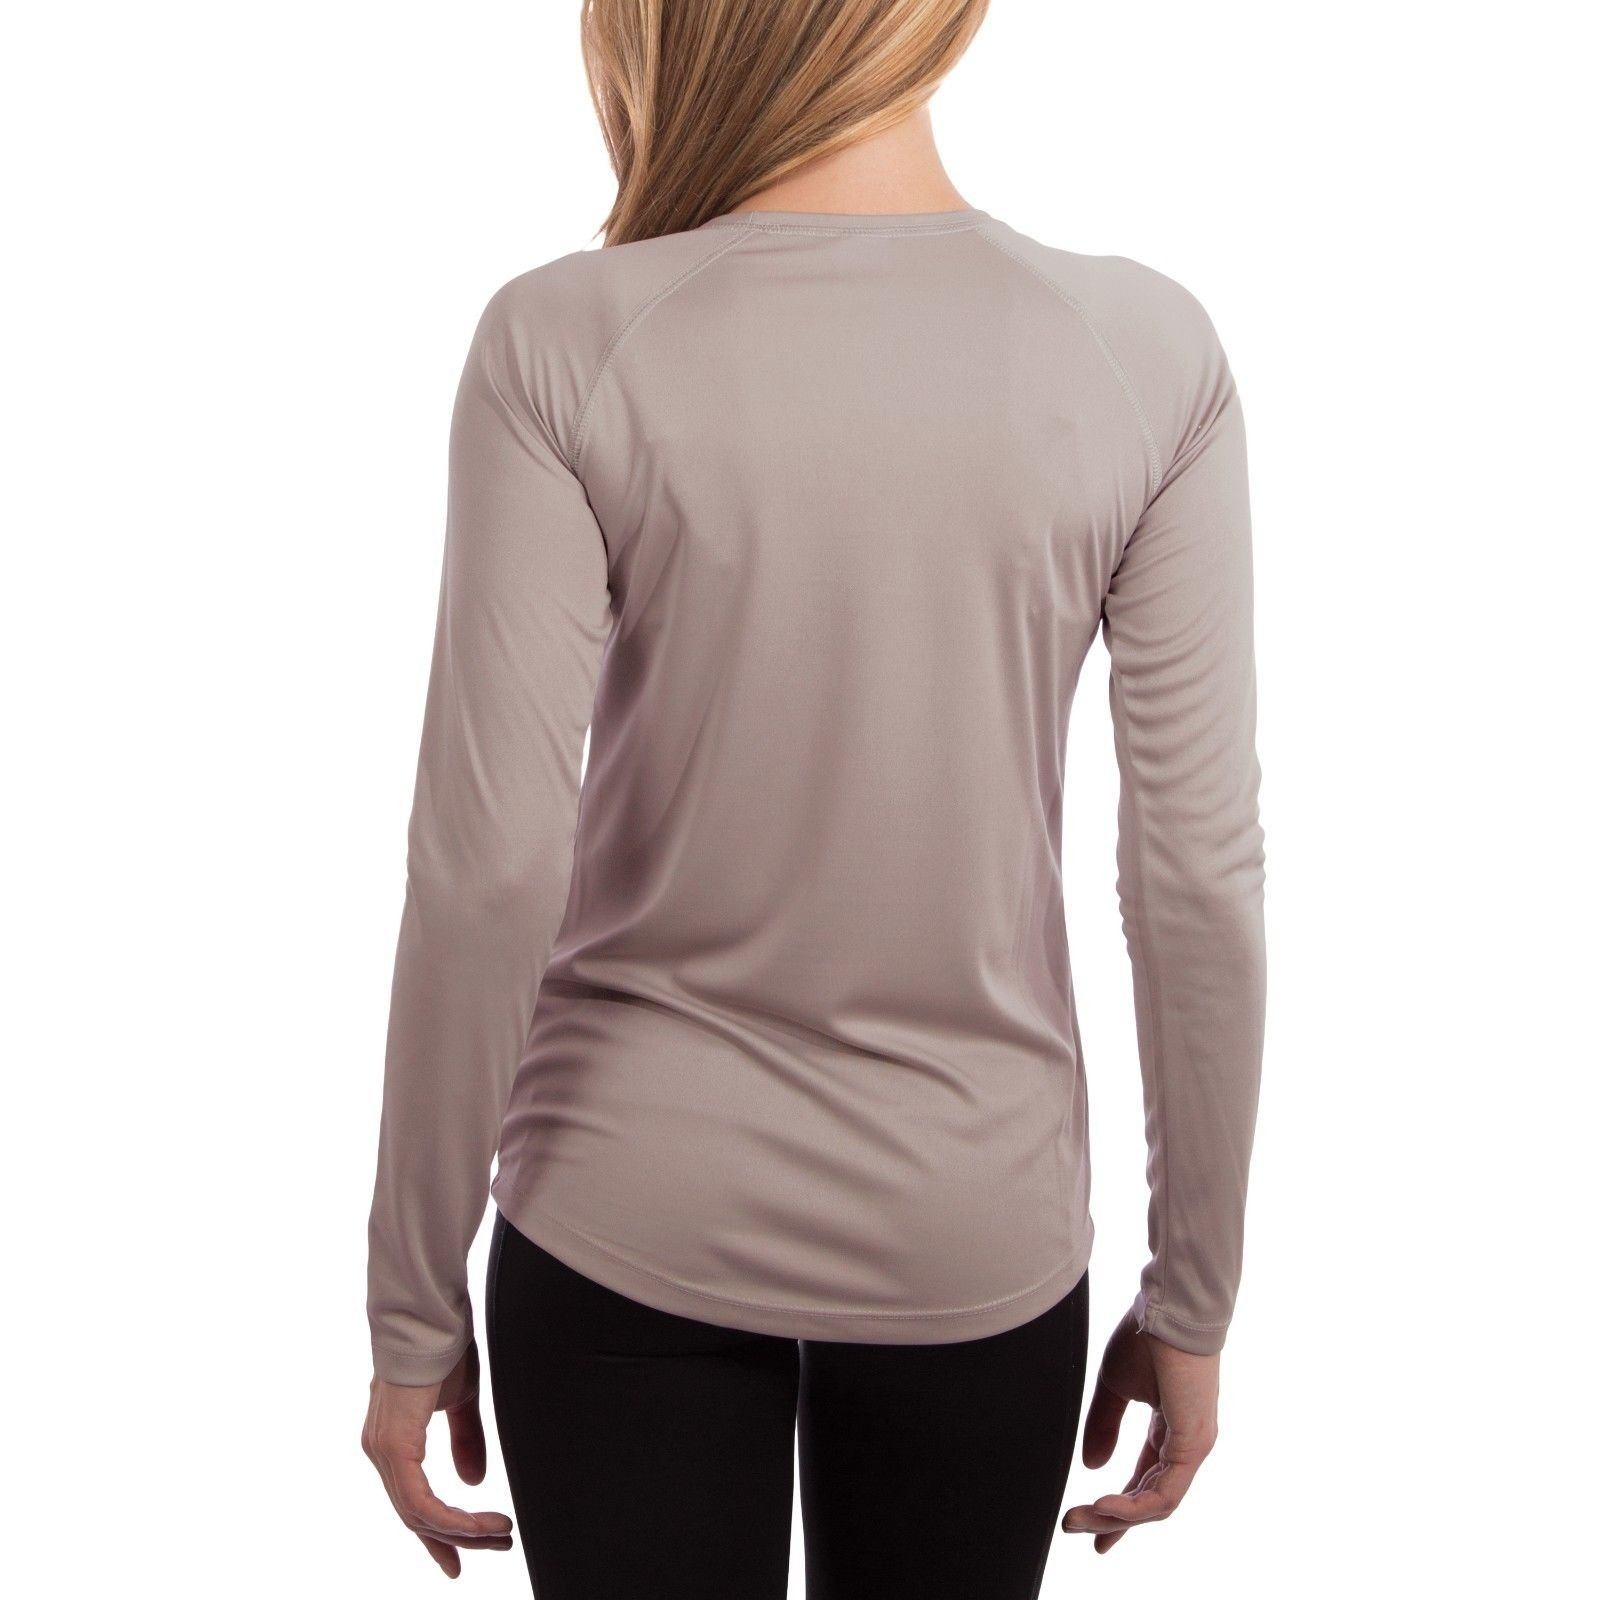 8f69522b Vapor Apparel Women's UPF 50+ UV/Sun Protection Performance T-Shirt ...